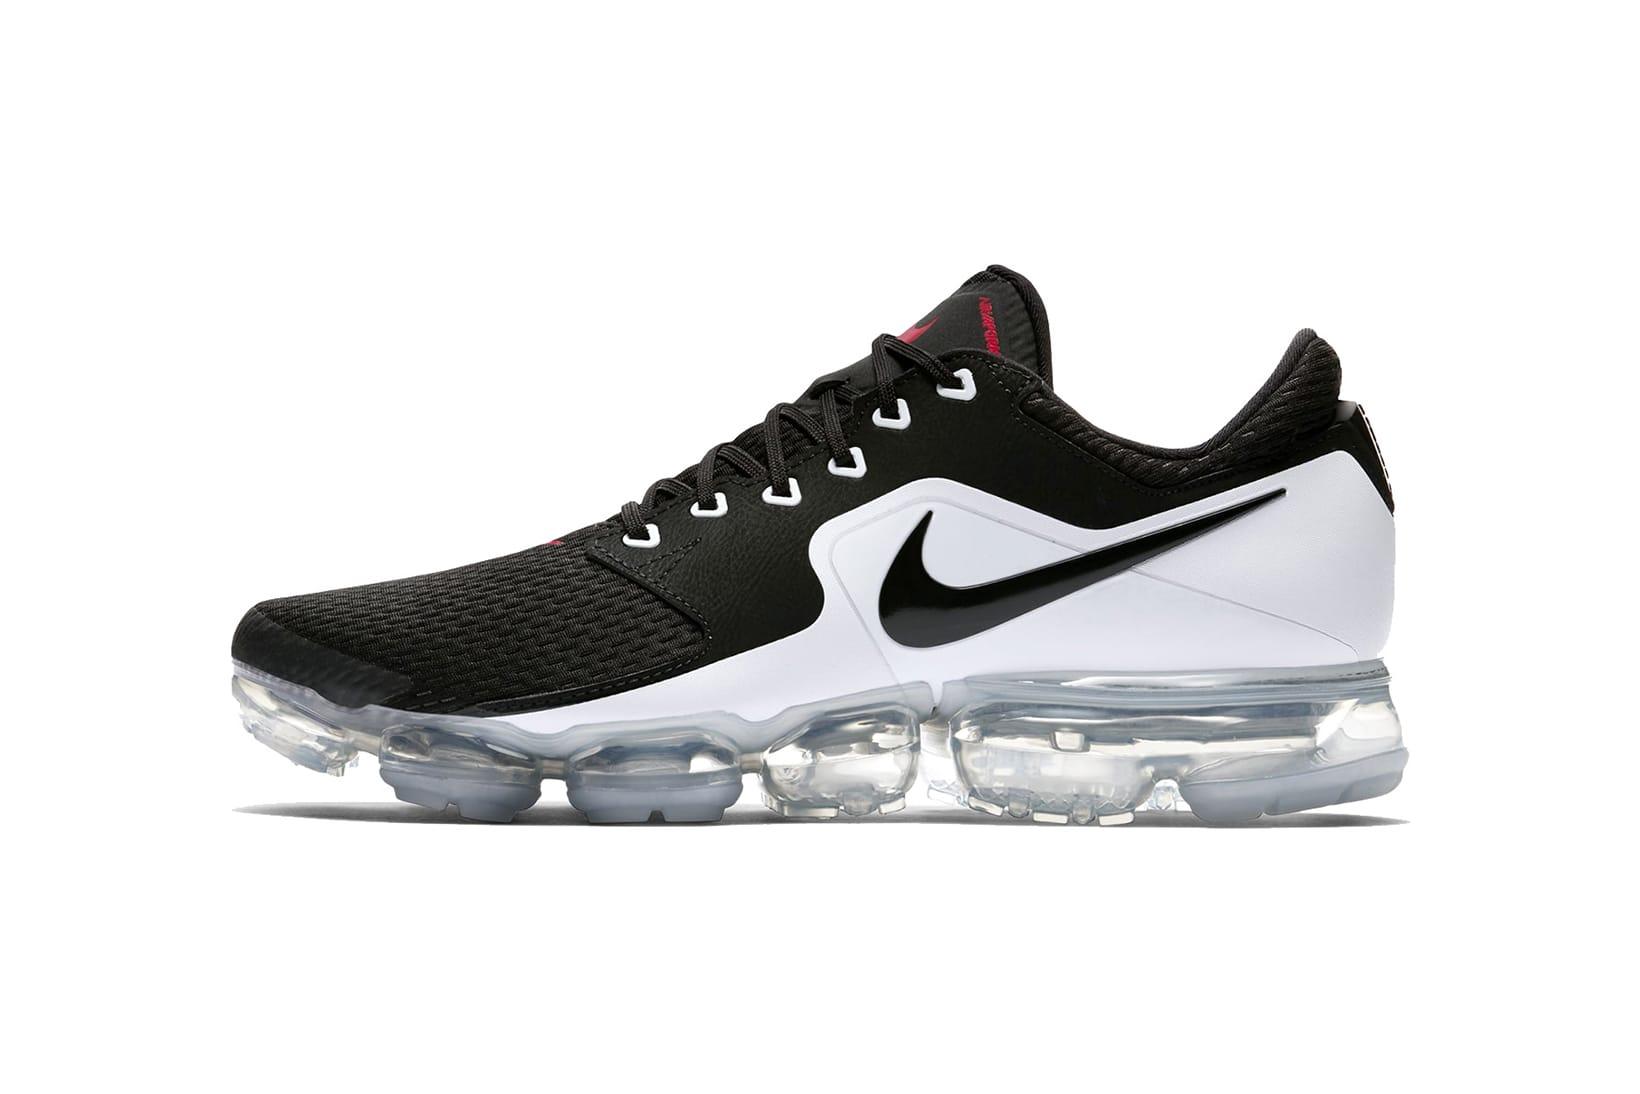 Nike Air VaporMax CS White/Black